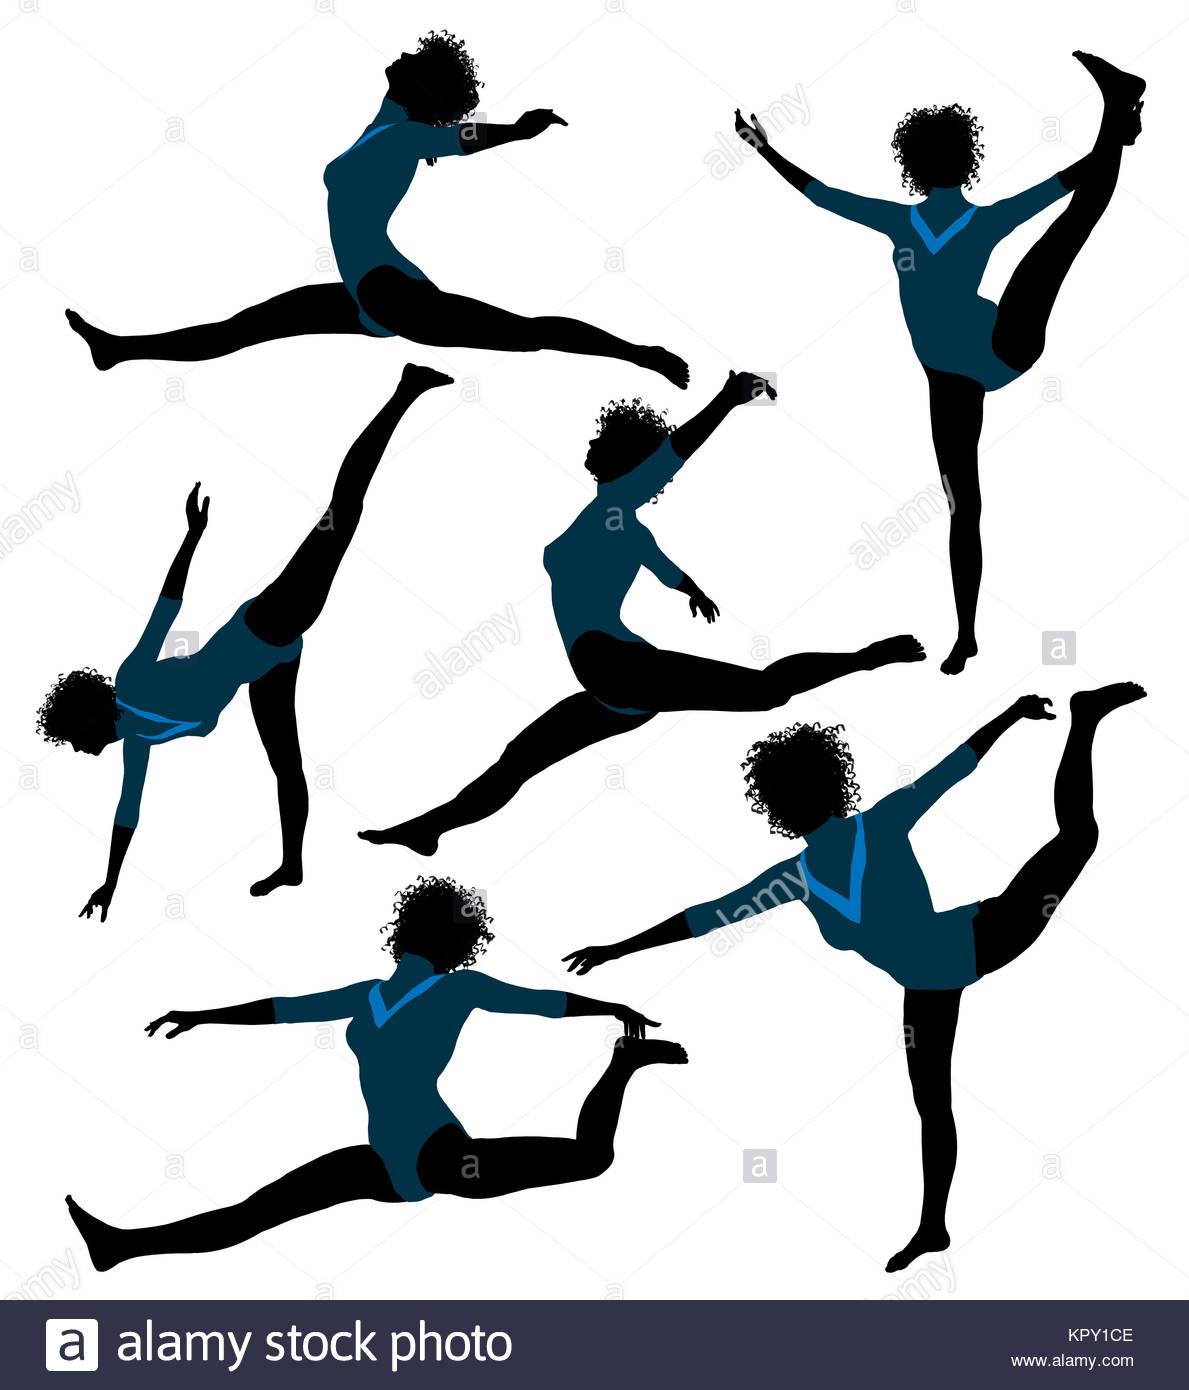 1189x1390 Femalefricanmerican Gymnastrt Illustration Silhouette On